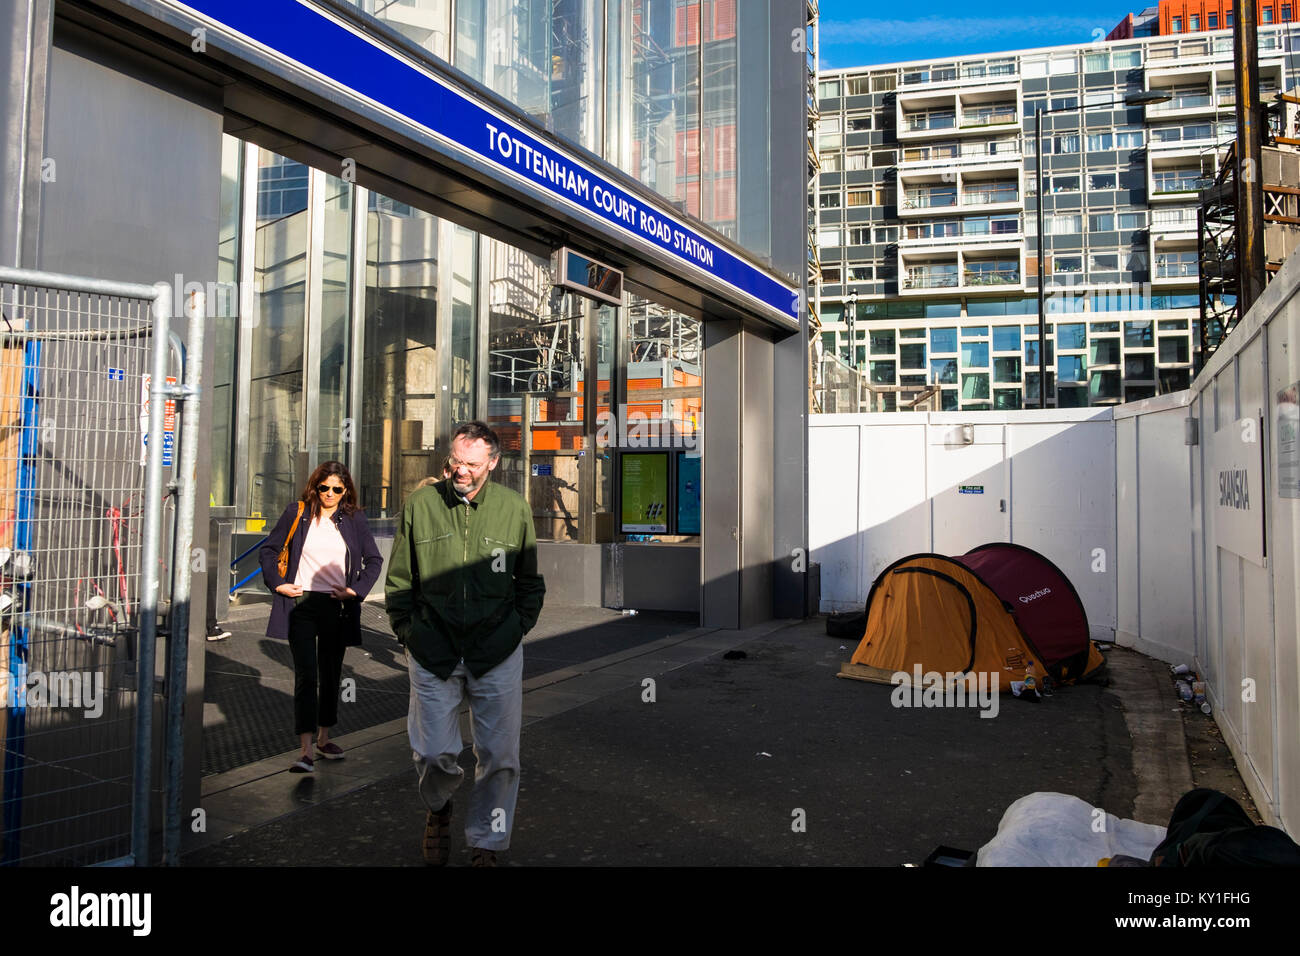 Homelessness outside a London tube station, uk - Stock Image